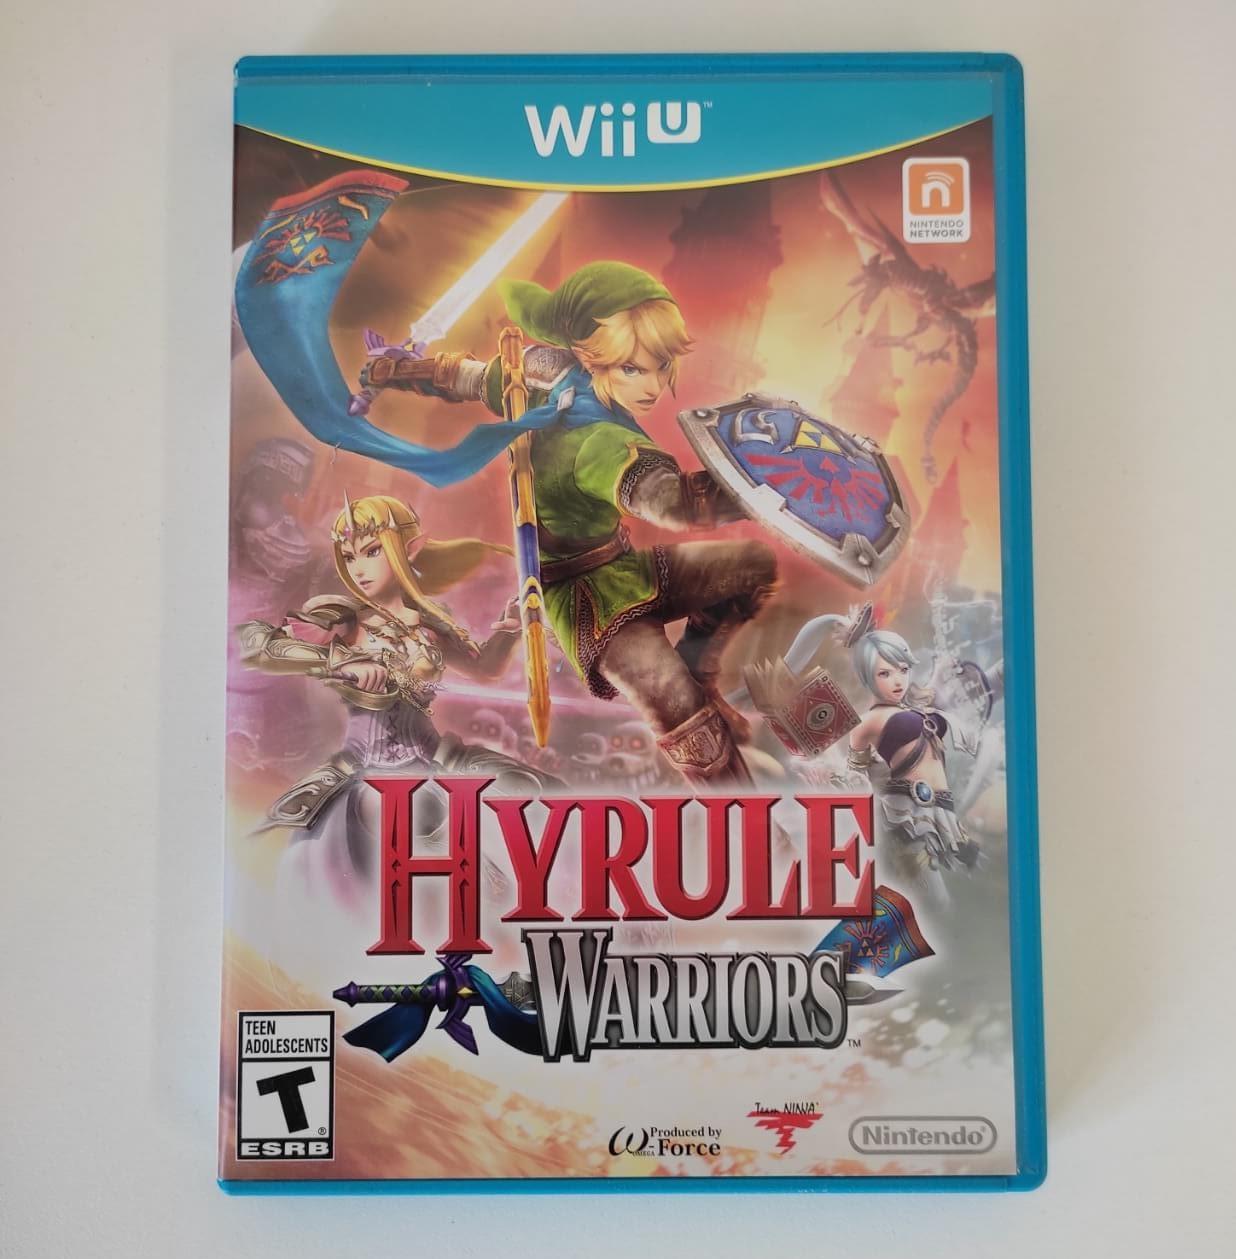 Hyrule Warriors - Nintendo Wii U - Usado